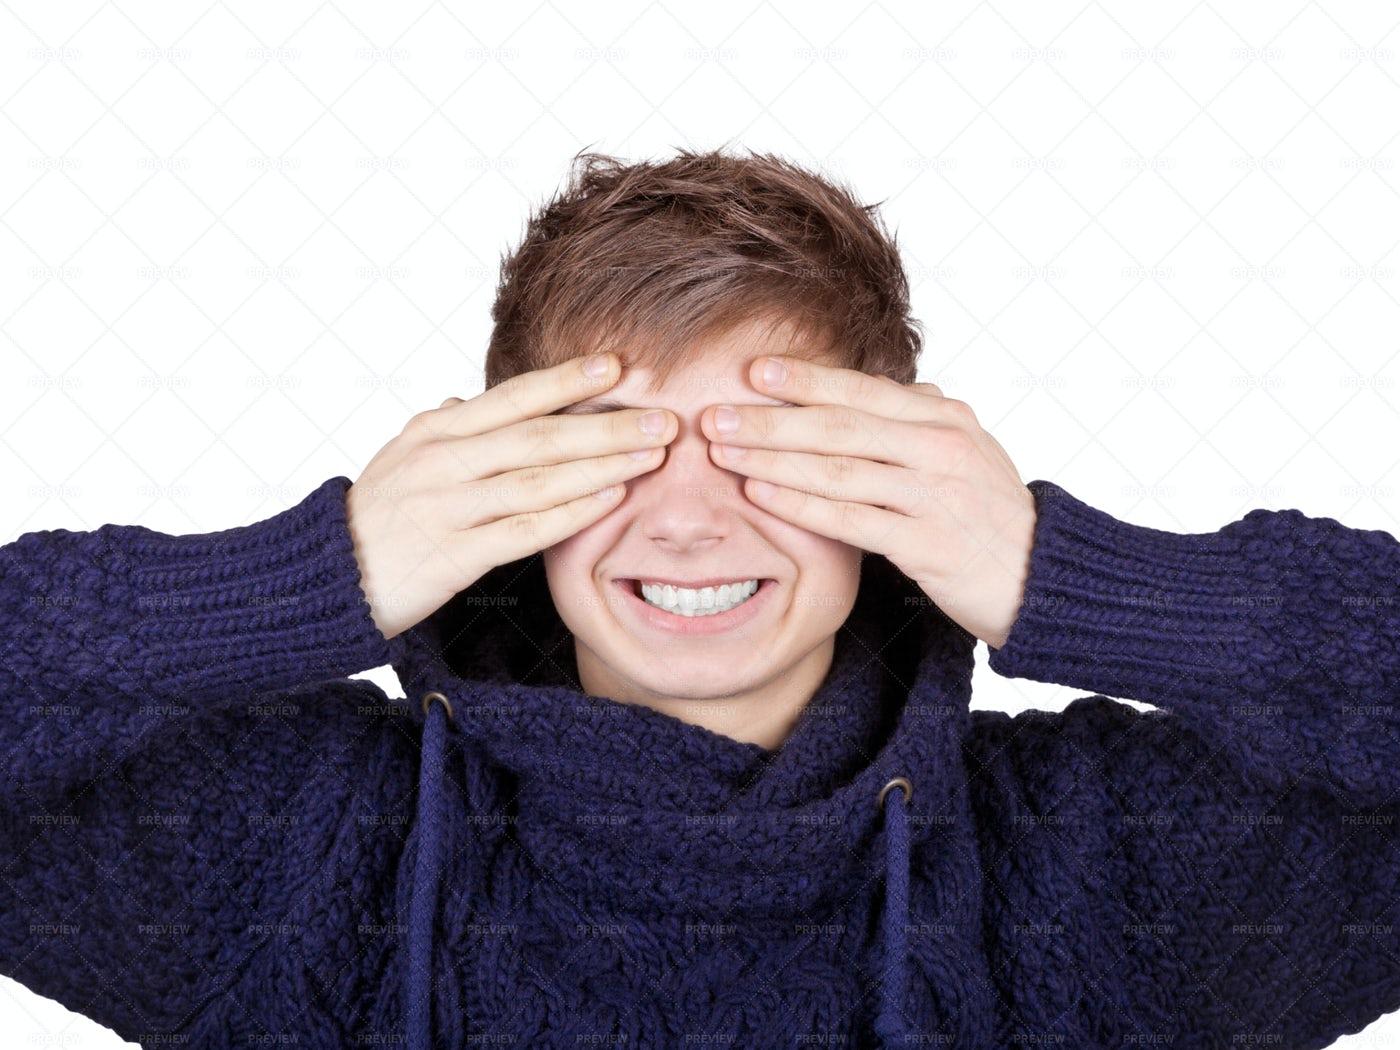 Boy Covering His Eyes: Stock Photos